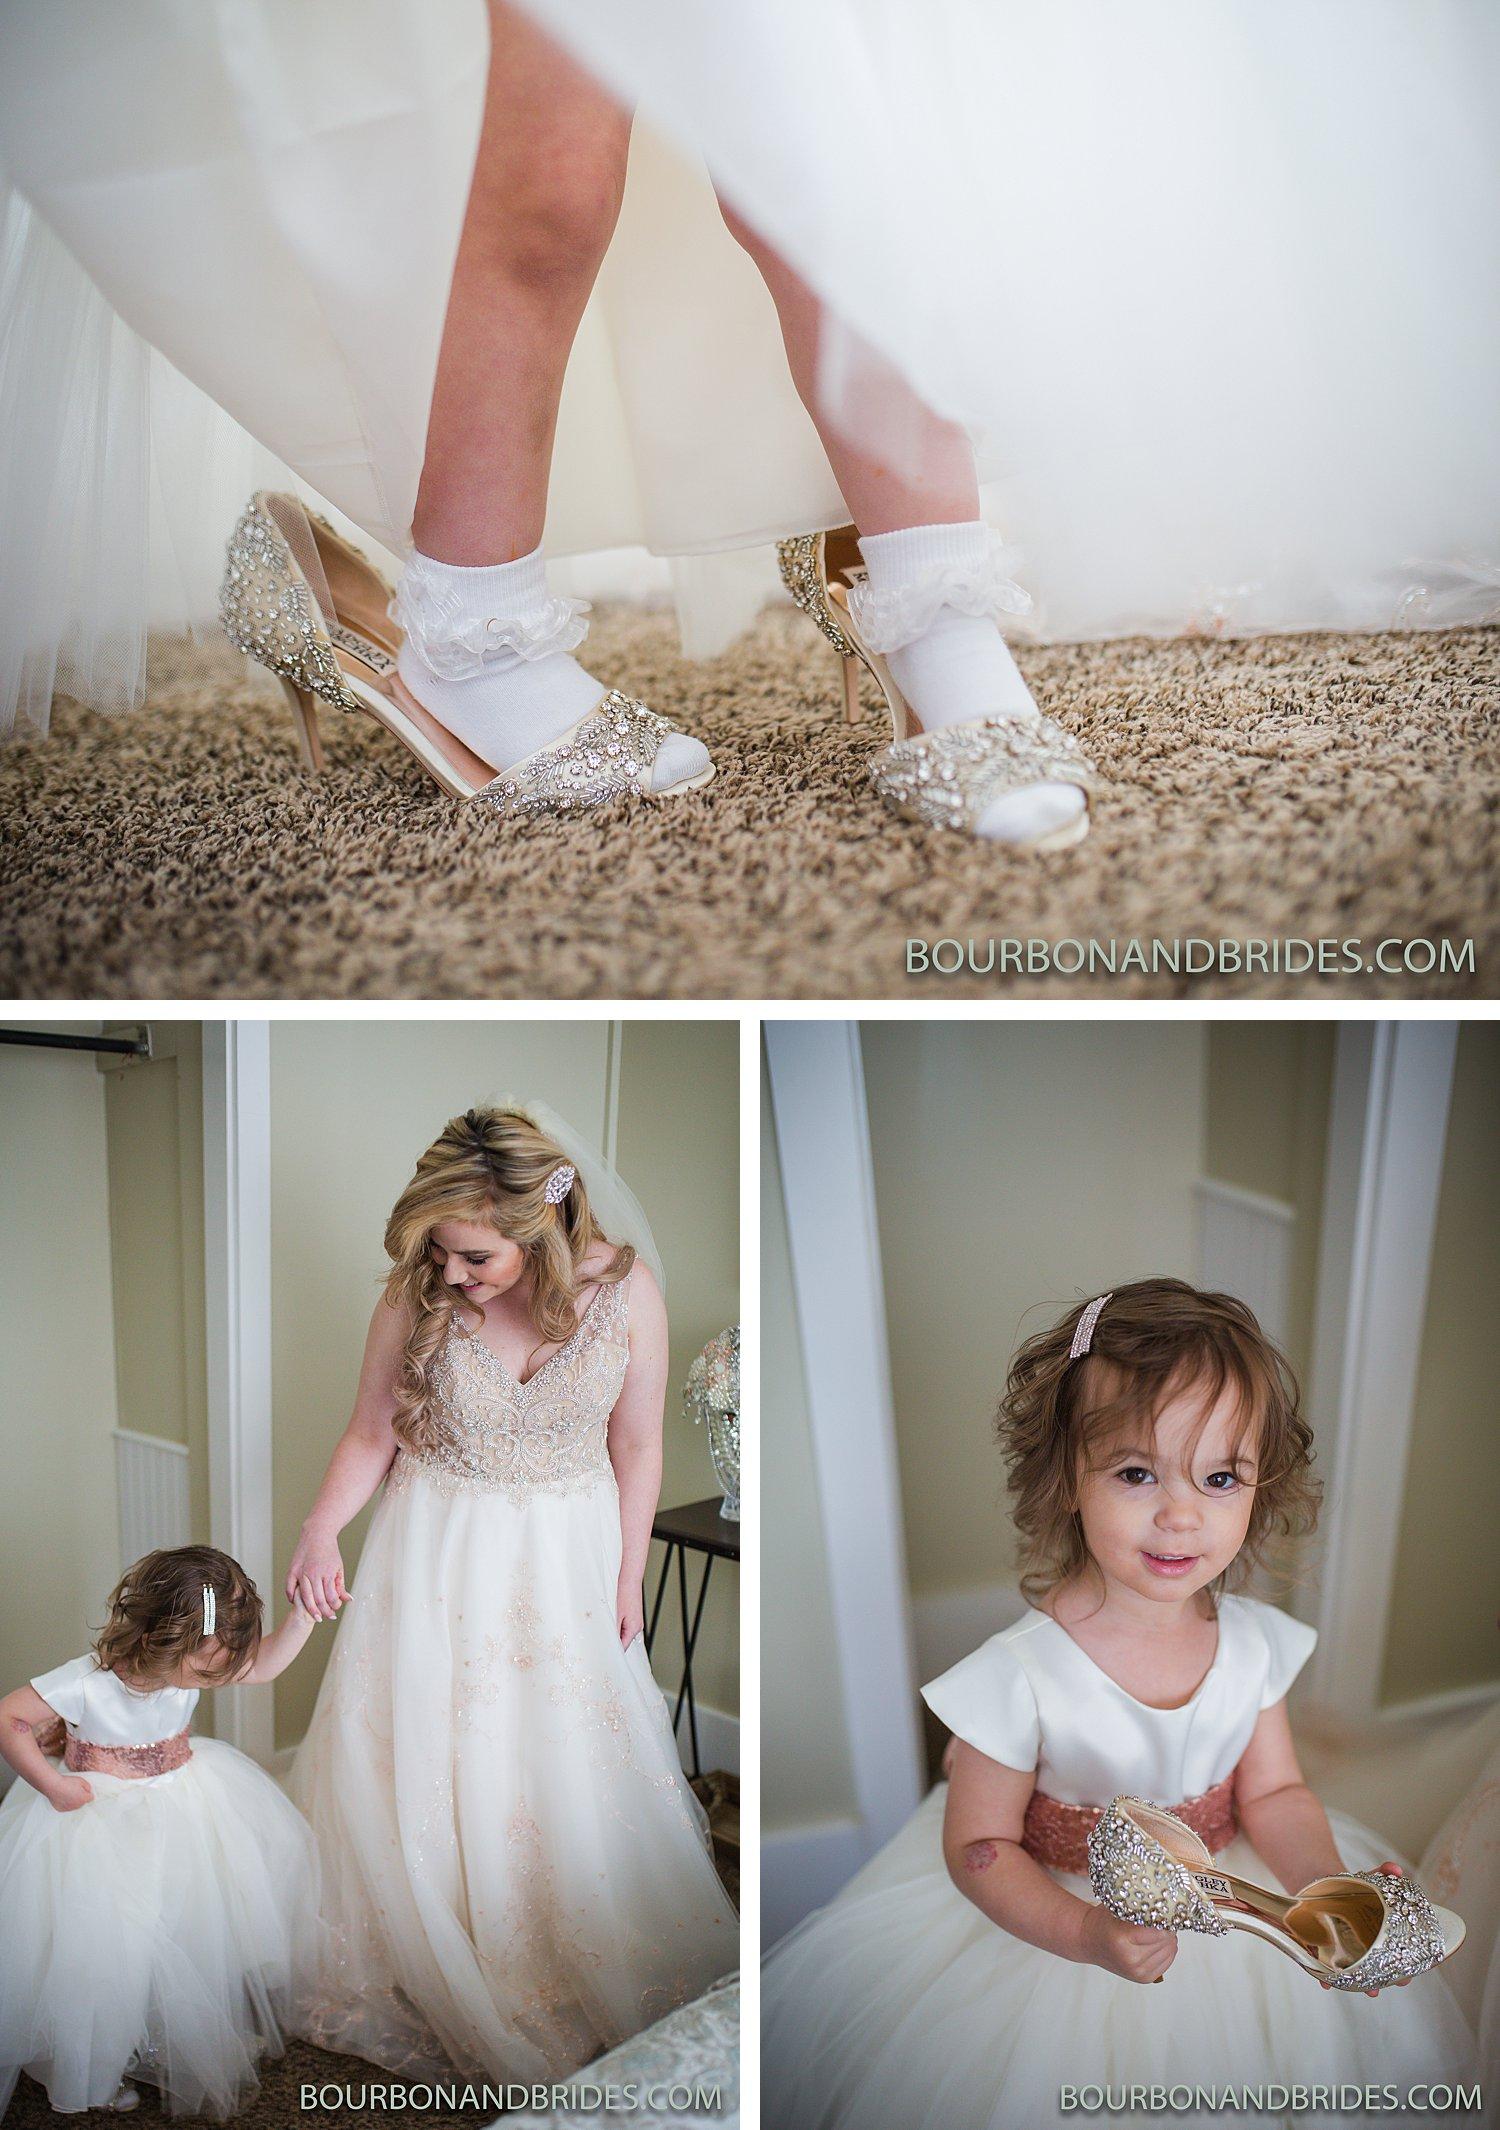 Lexington-wedding-flower-girl-kentucky.jpg